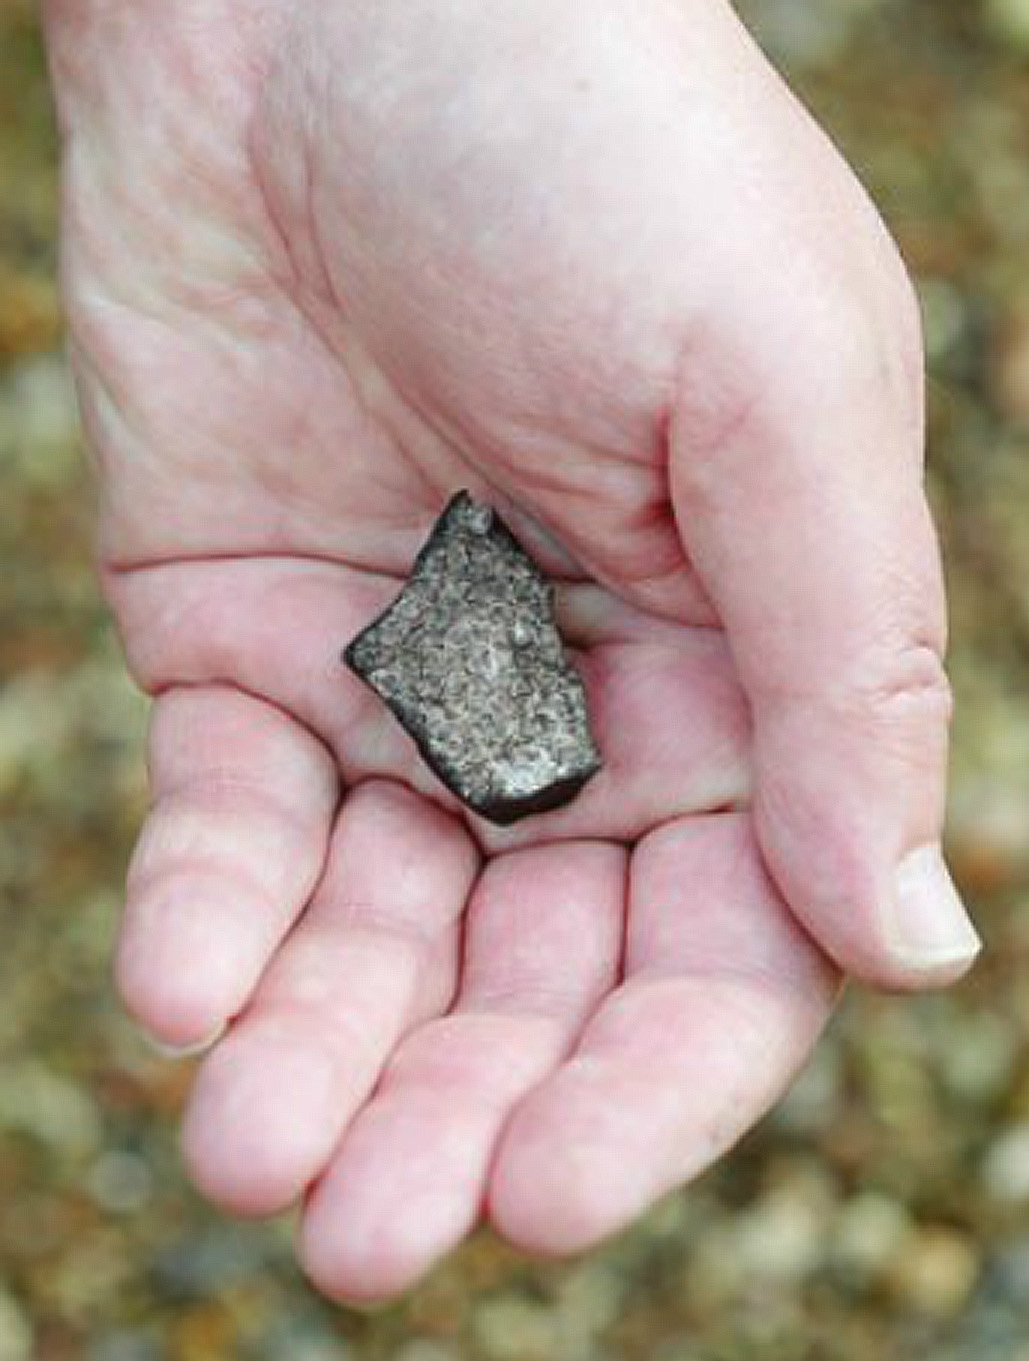 Martin Dyrbye's meteorite (18 g) found in Egholmvej in Vanløse/ photo: Martin Sørensen / Vanløse Bladet